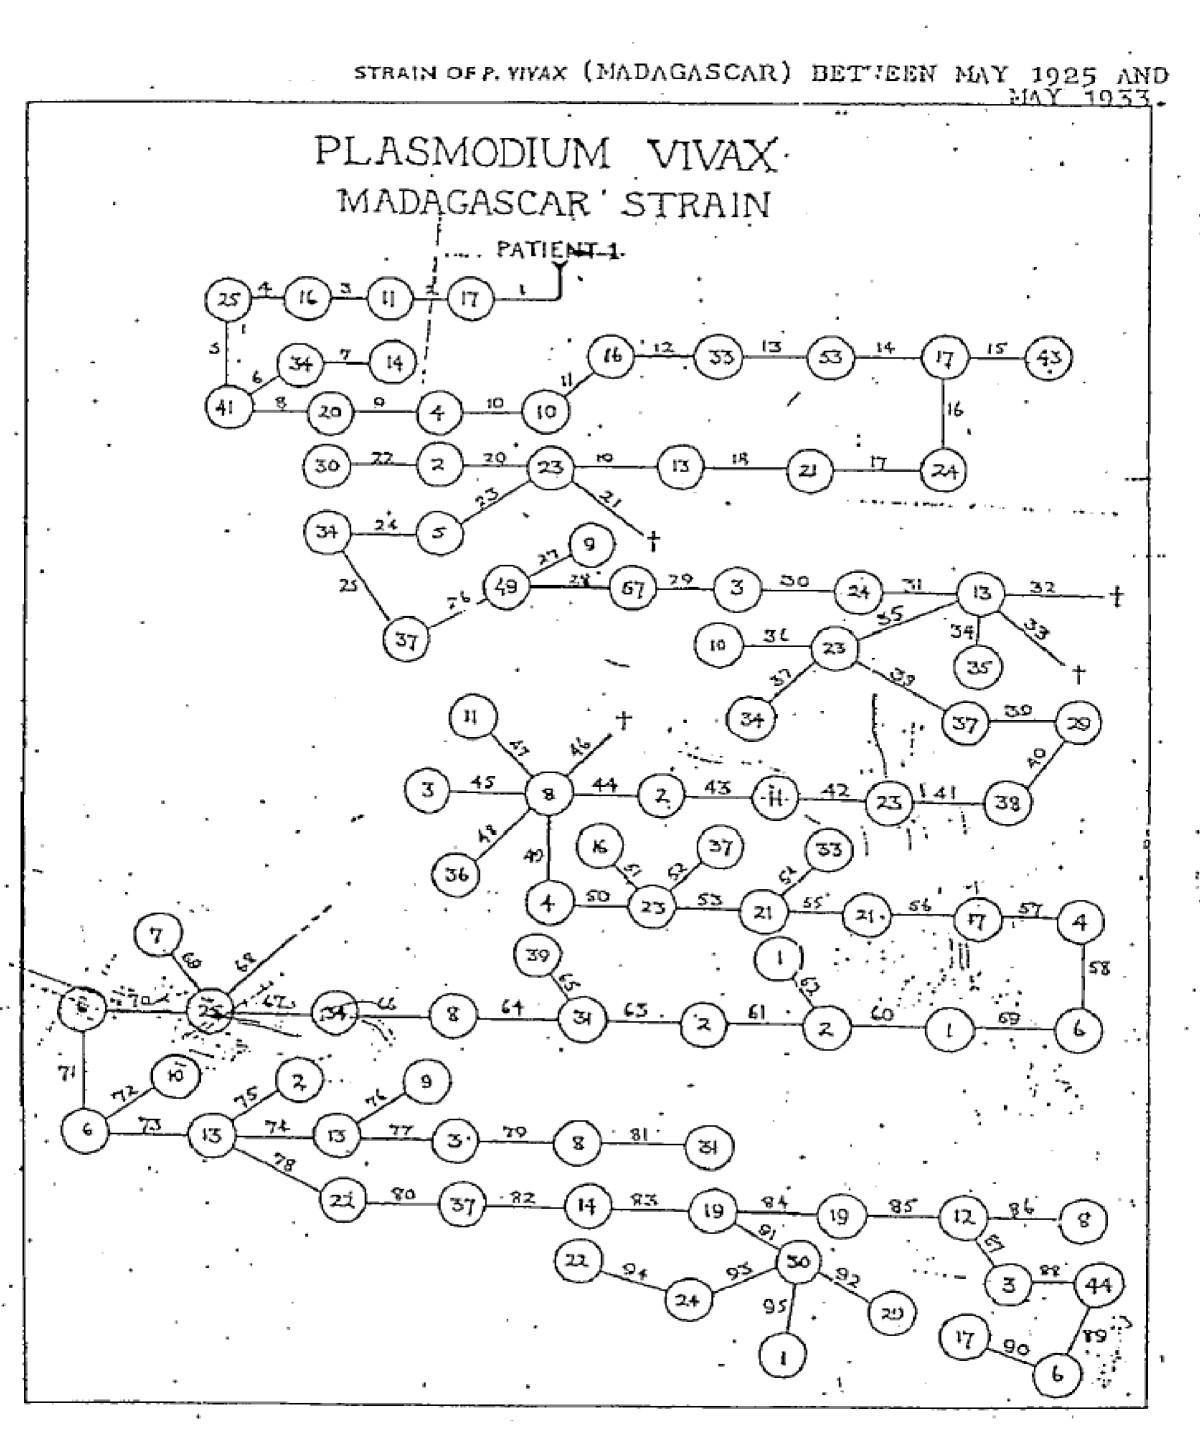 determinants of relapse periodicity in plasmodium vivax malaria Business Office Manager Construction Resume figure 4